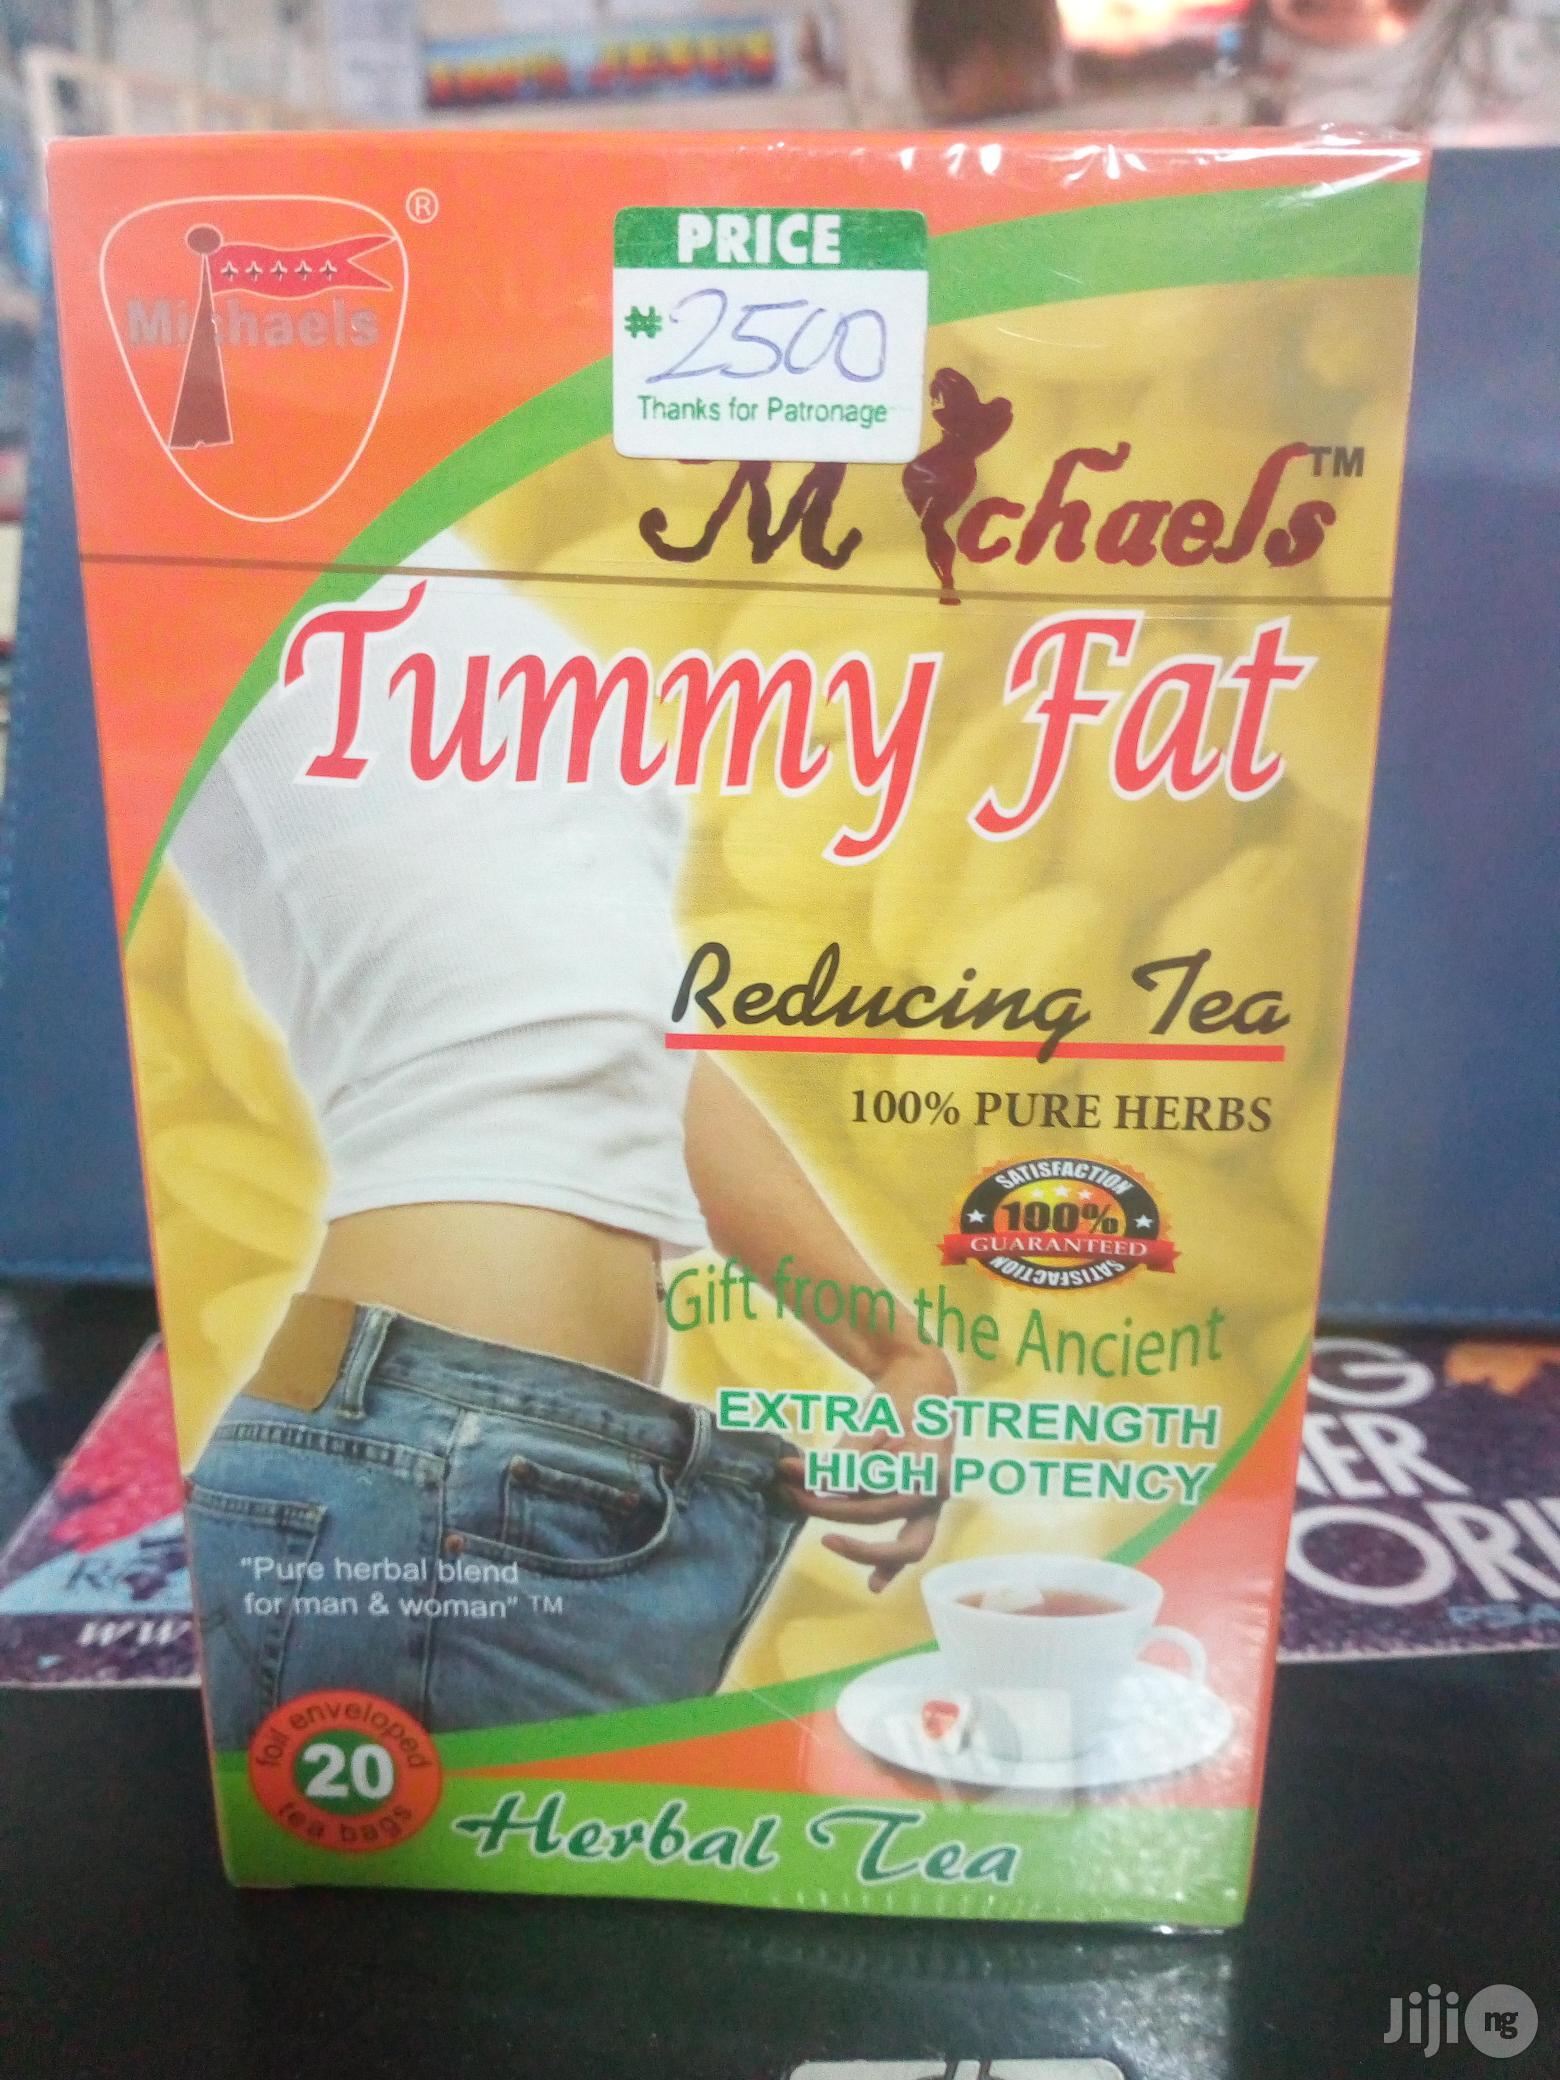 Tummy Fat Reducing Tea.